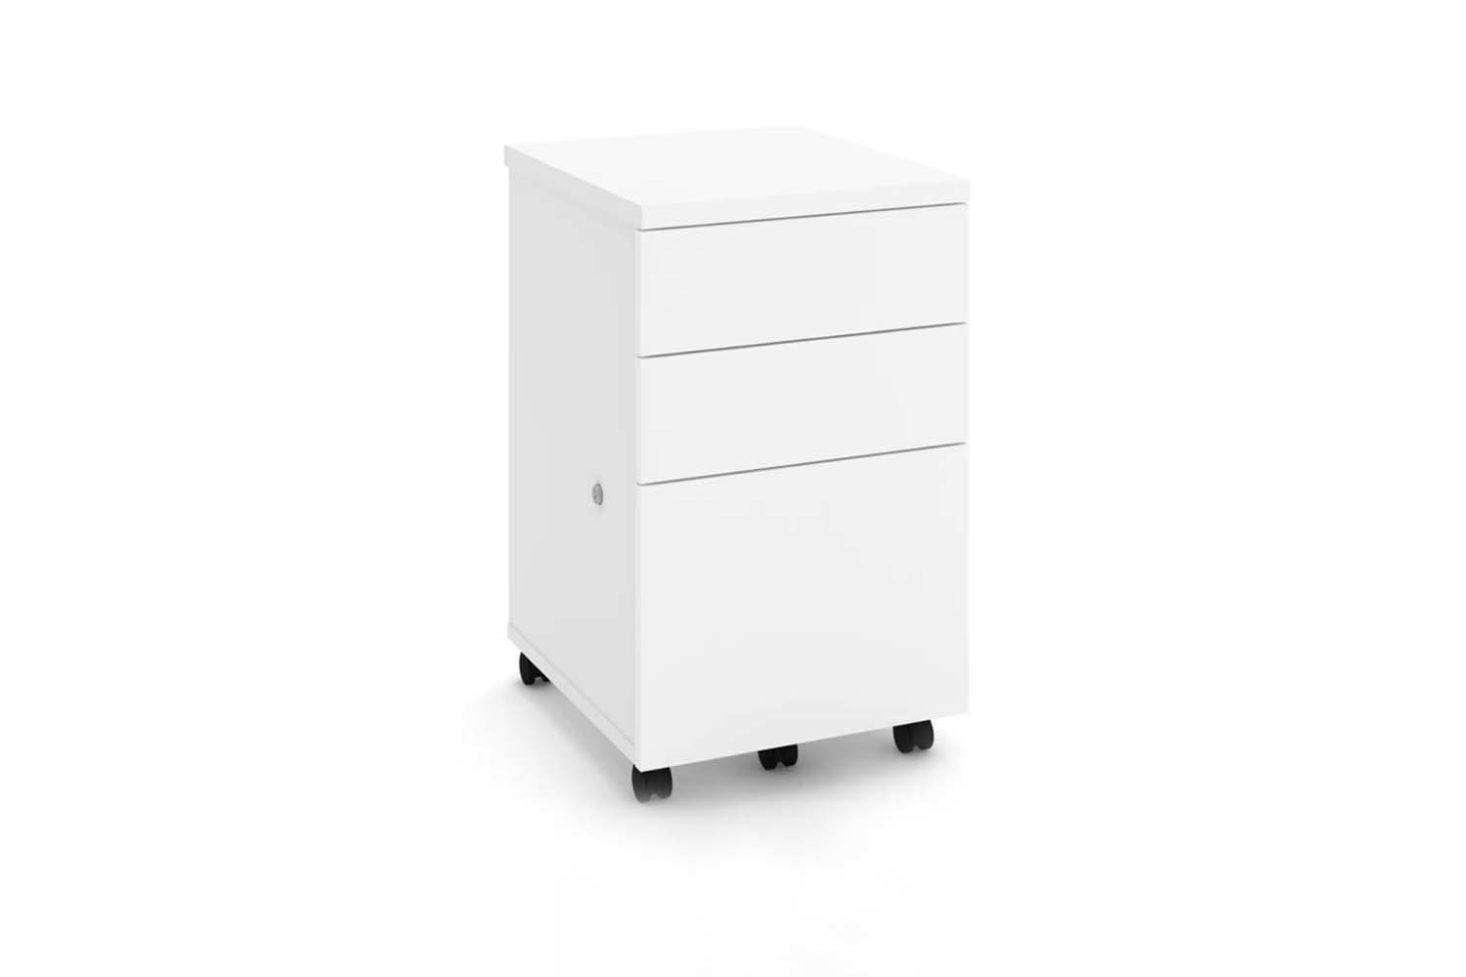 All Modern 3 Drawer Mobile Vertical Filing Cabinet